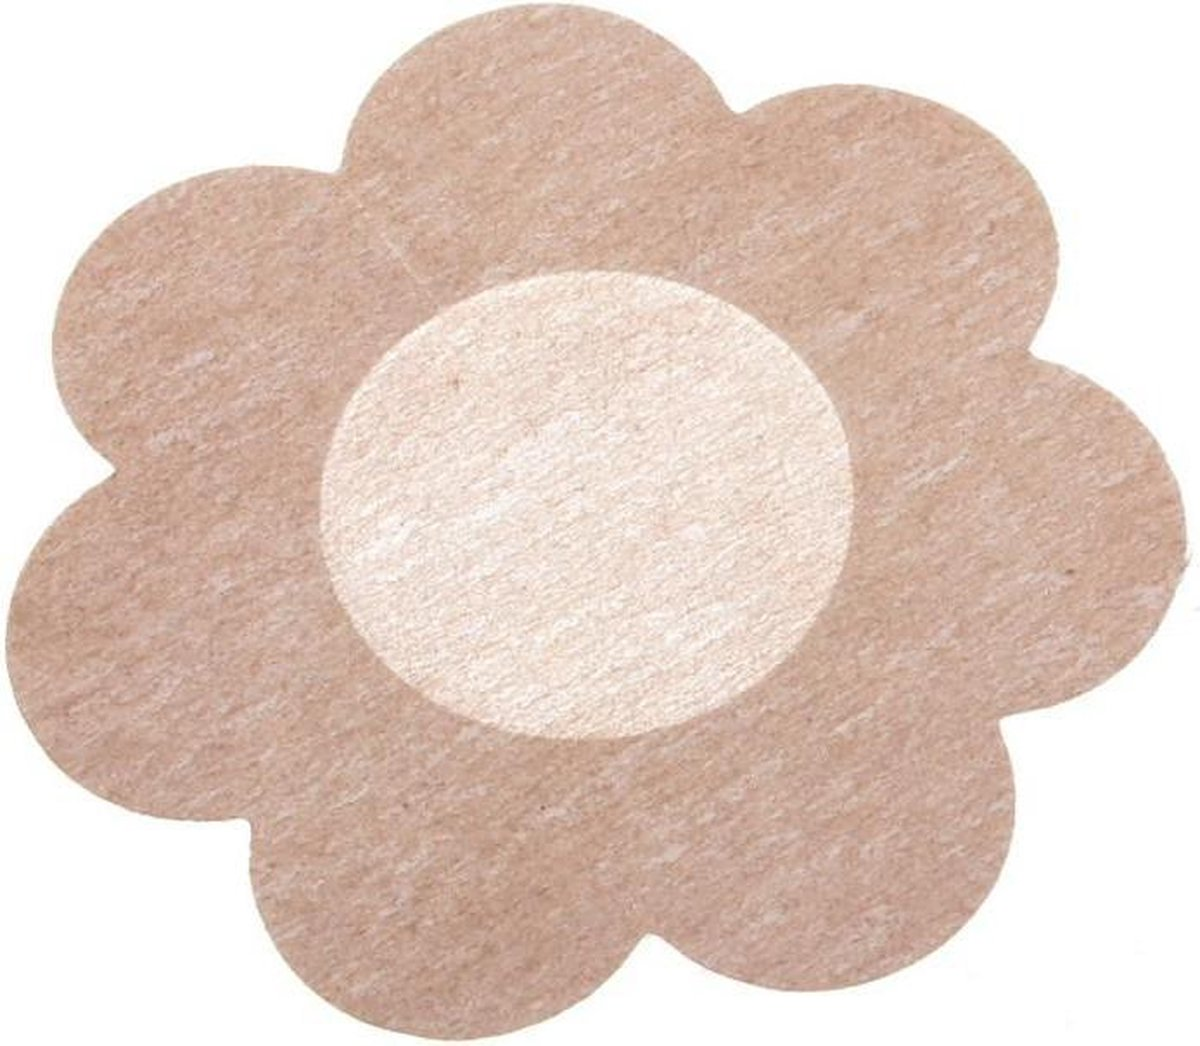 Tepel Sticker 5 Paar - 10 stuks - Tepel Cover - Nipple Patch - Tepel Bescherming - Beige